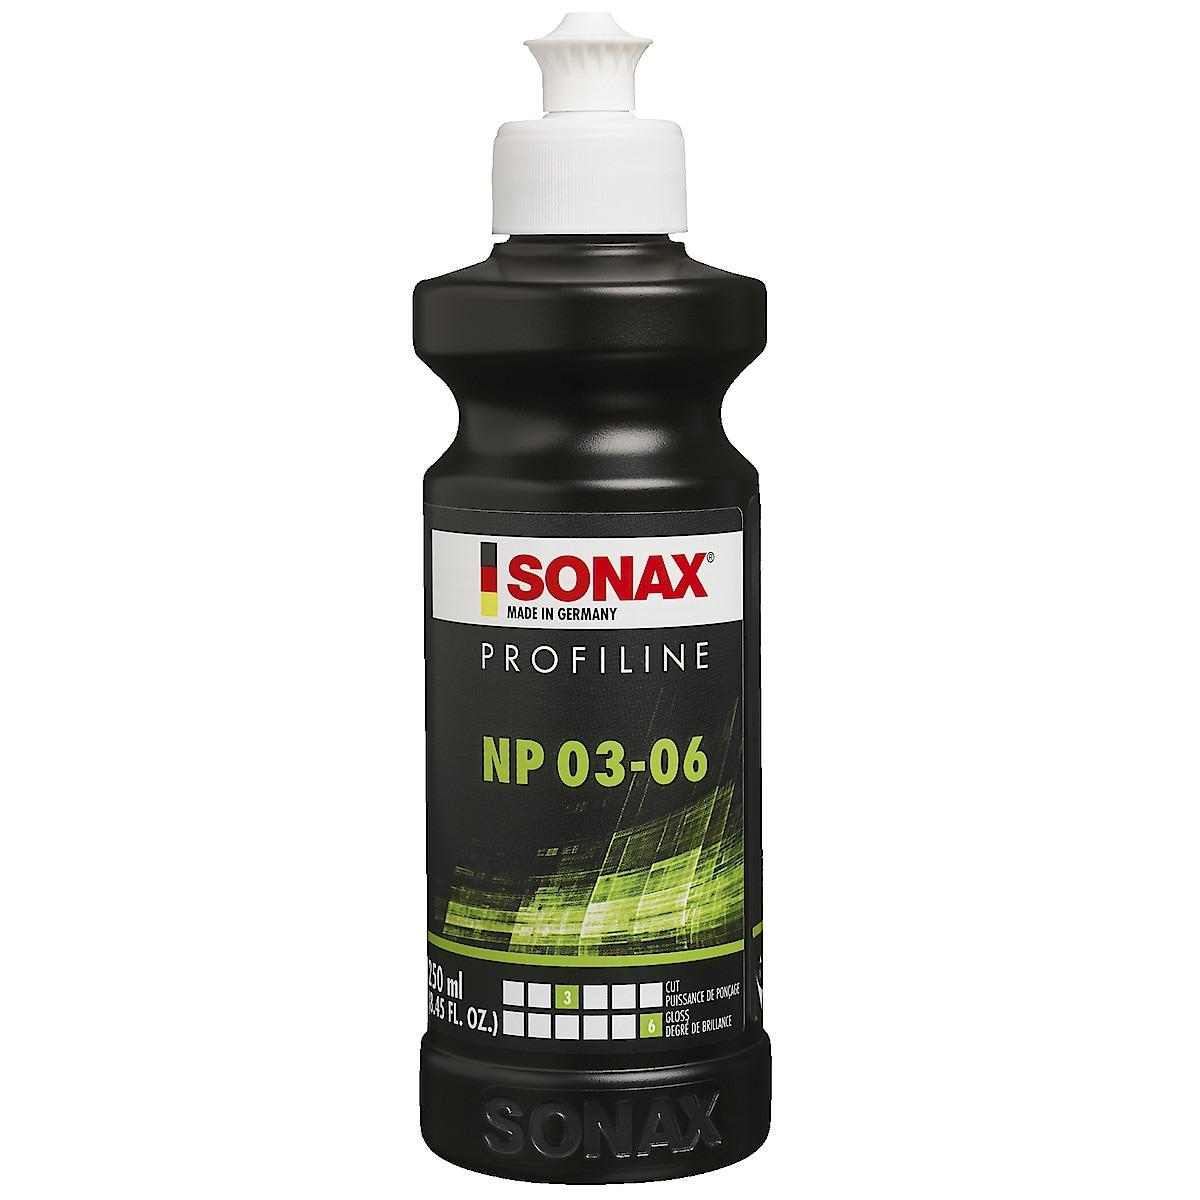 Glanspolering Sonax ProfiLine NP 03-06